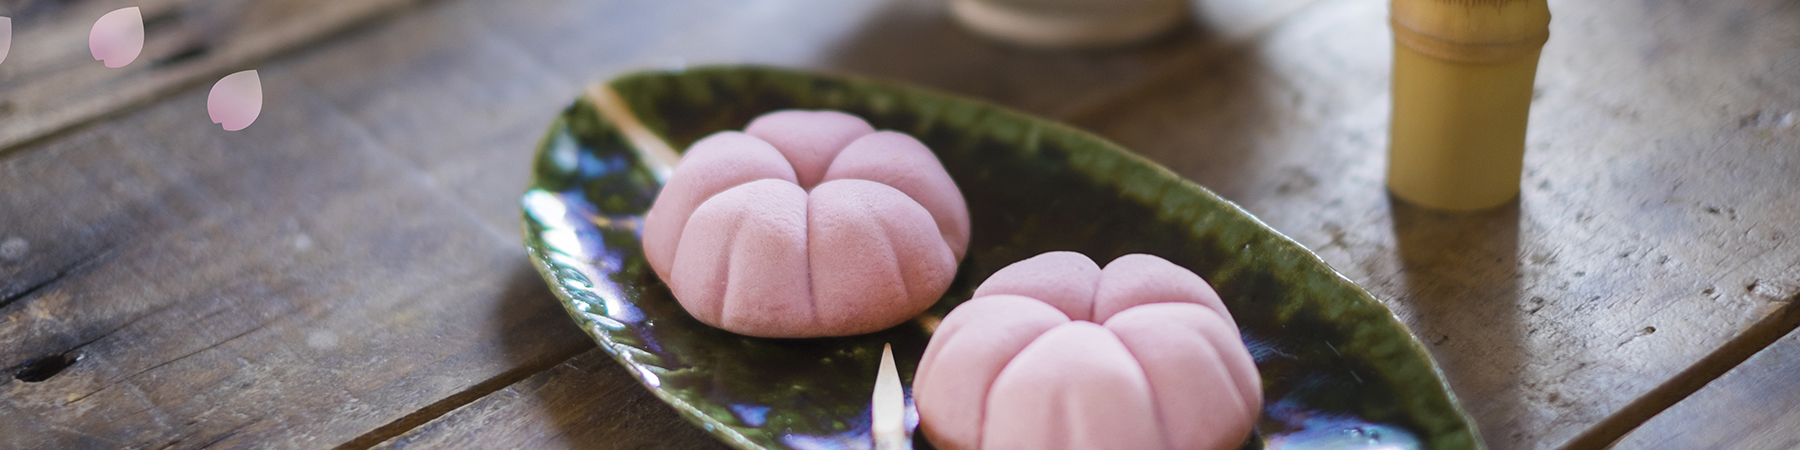 日本生活環境支援協会 | 和菓子パティシエ認定試験